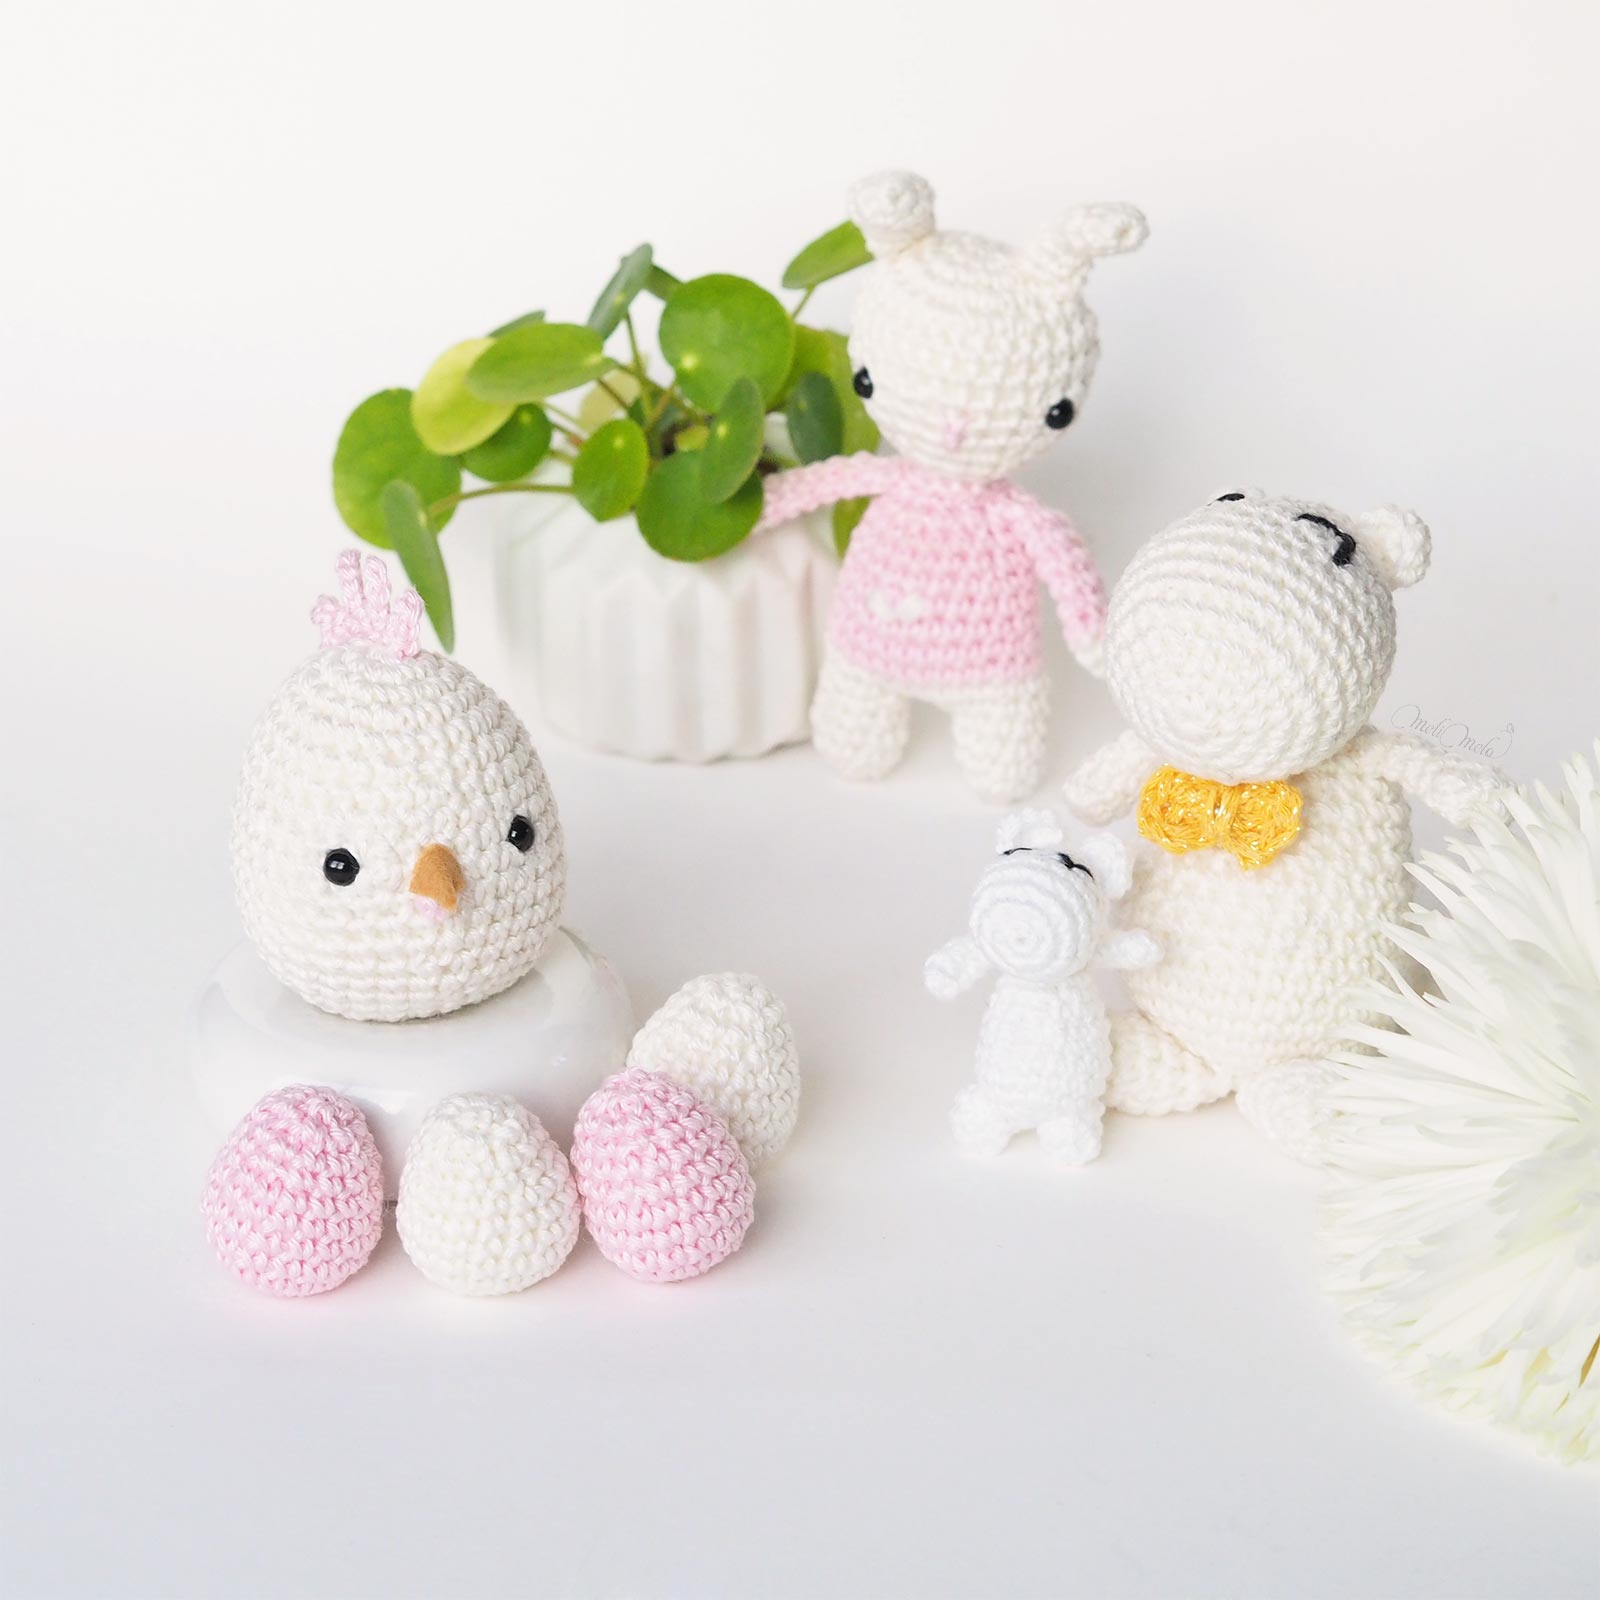 lapin oeuf Moomin crochet pâques Catona Scheeepjes pilea boutures laboutiquedemelimelo